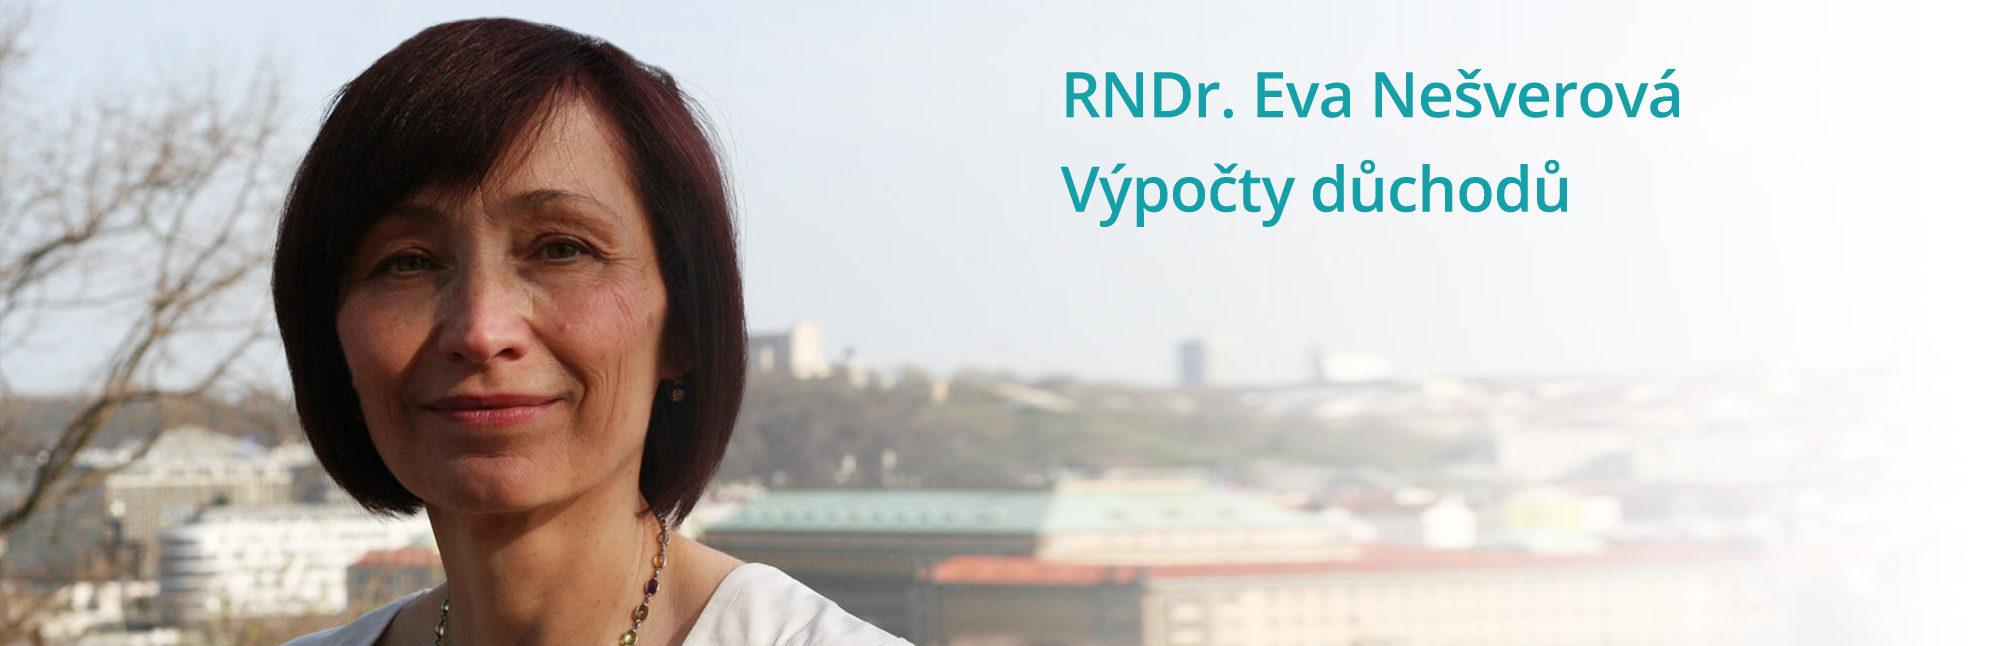 RNDr. Eva Nešverová – Výpočty důchodů